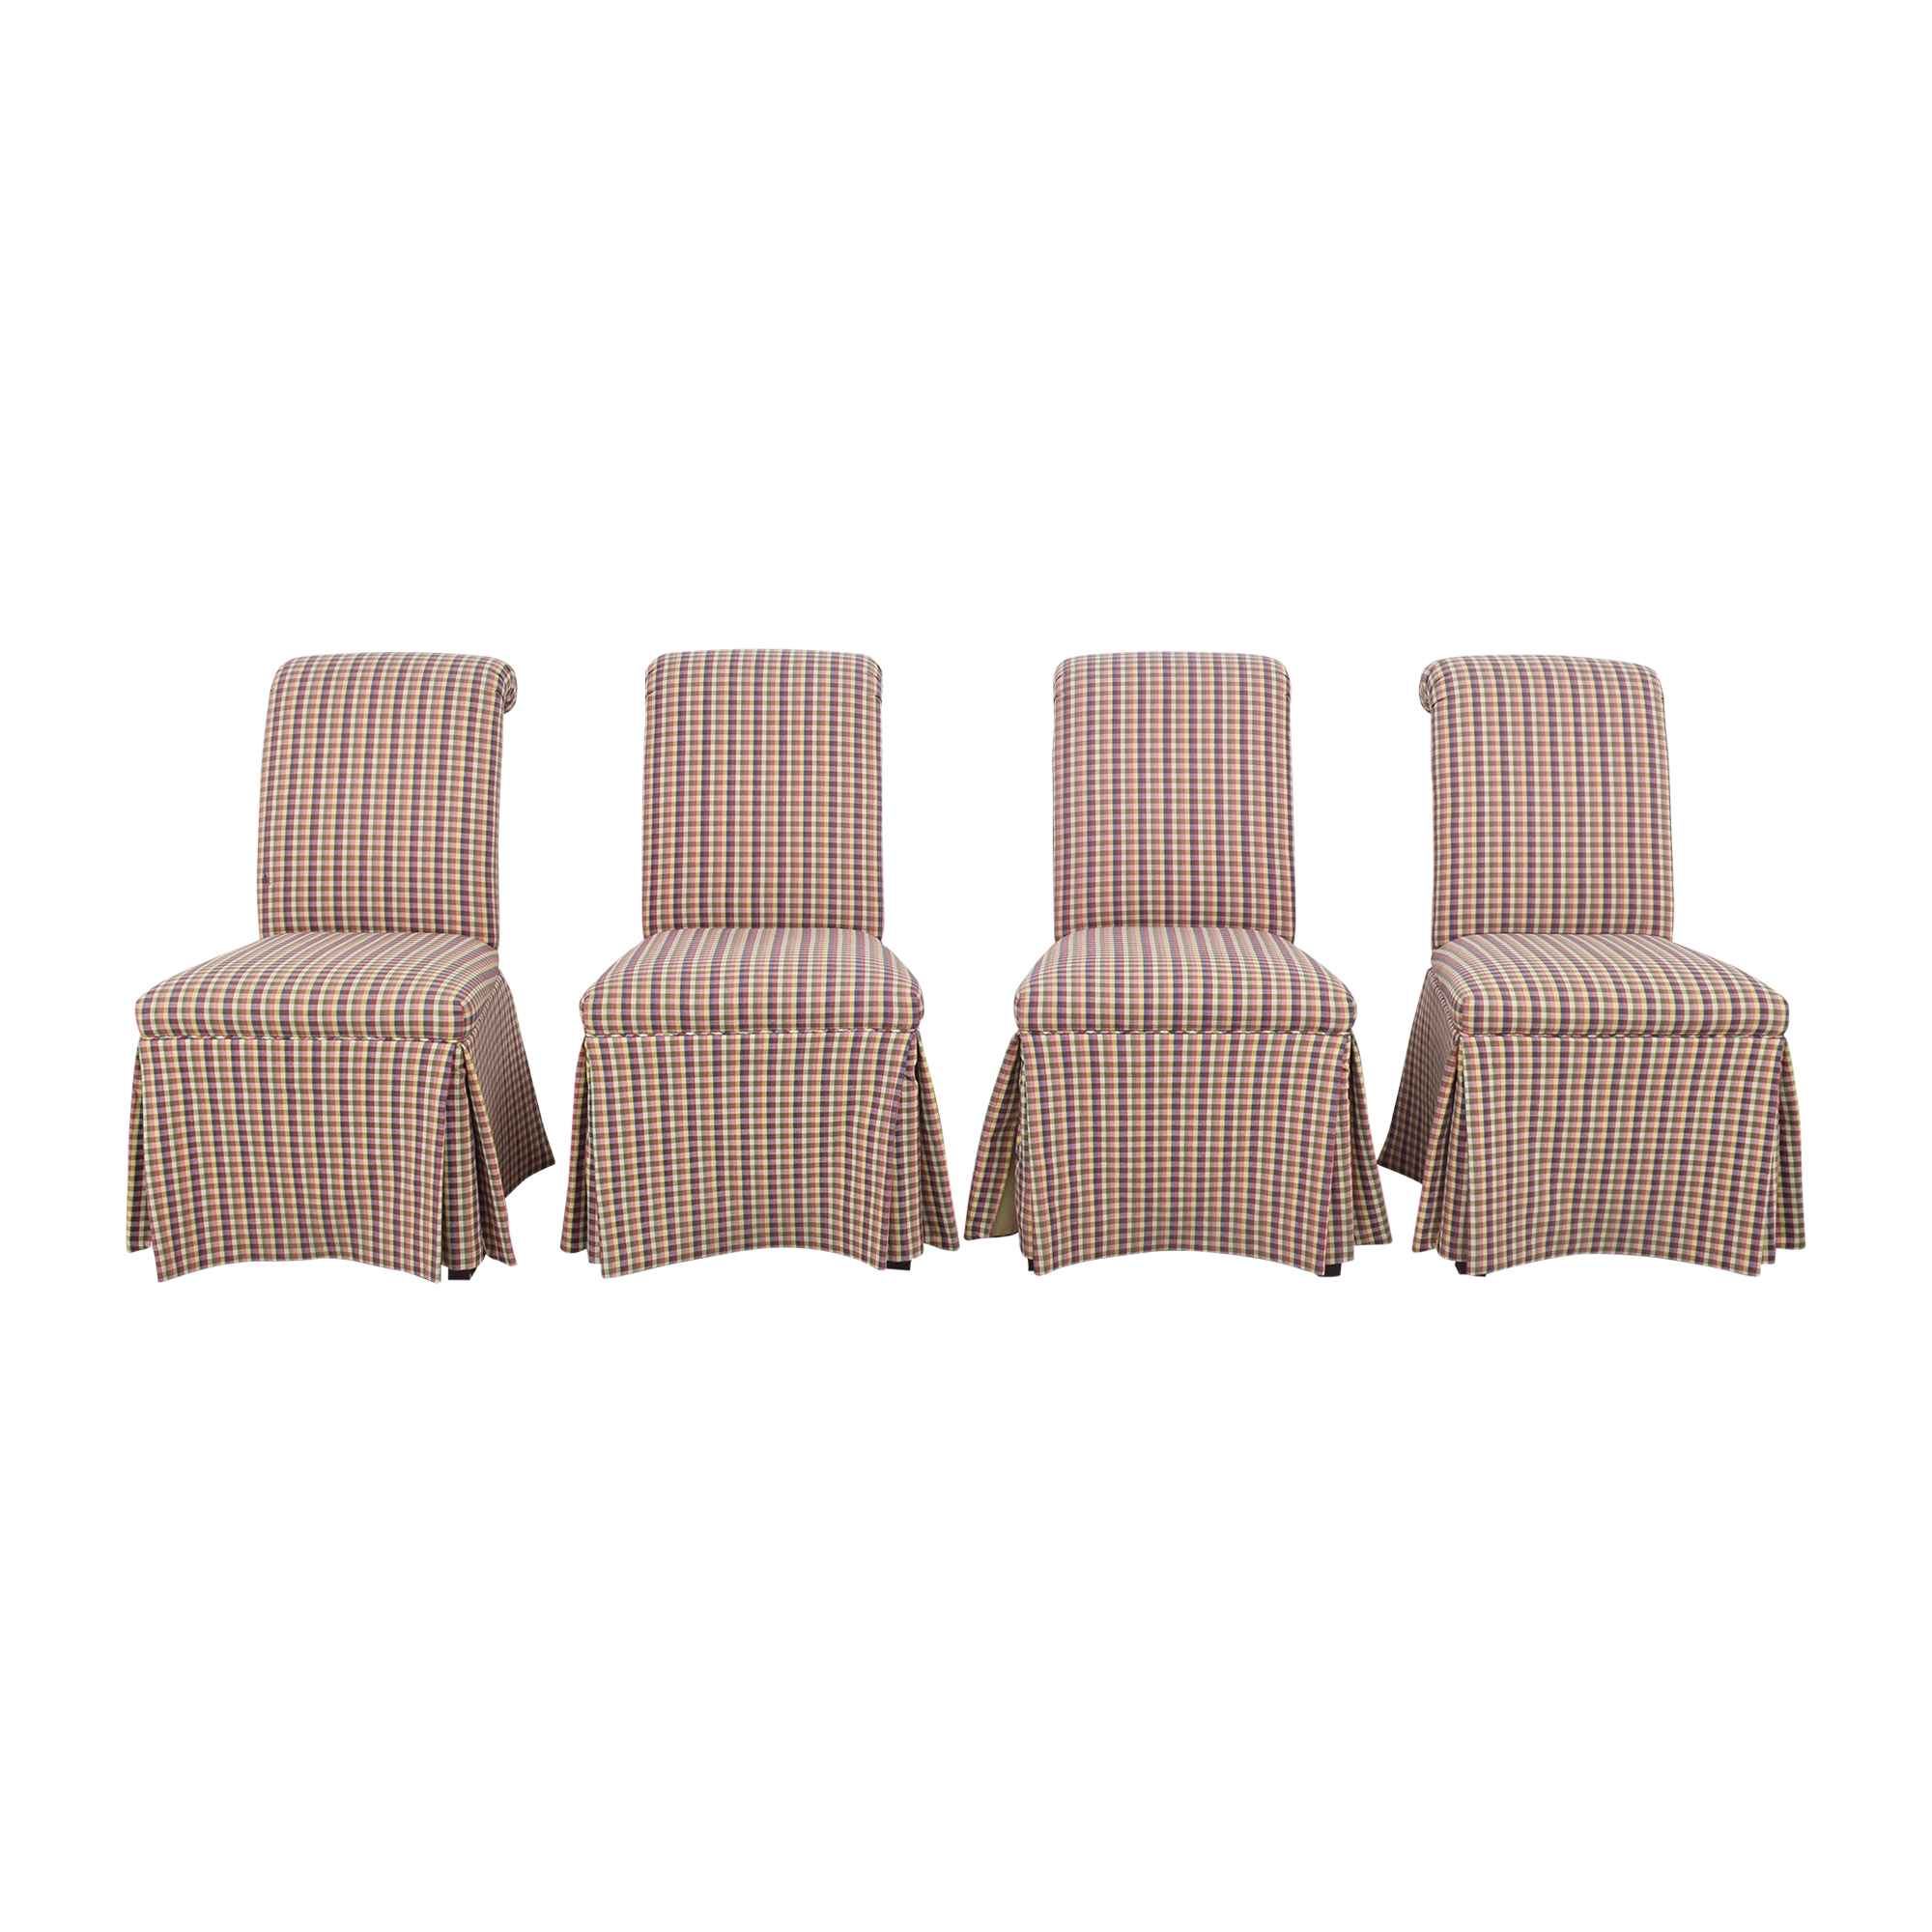 buy Sherrill Furniture Slipcovered Scroll Top Dining Chairs Sherrill Furniture